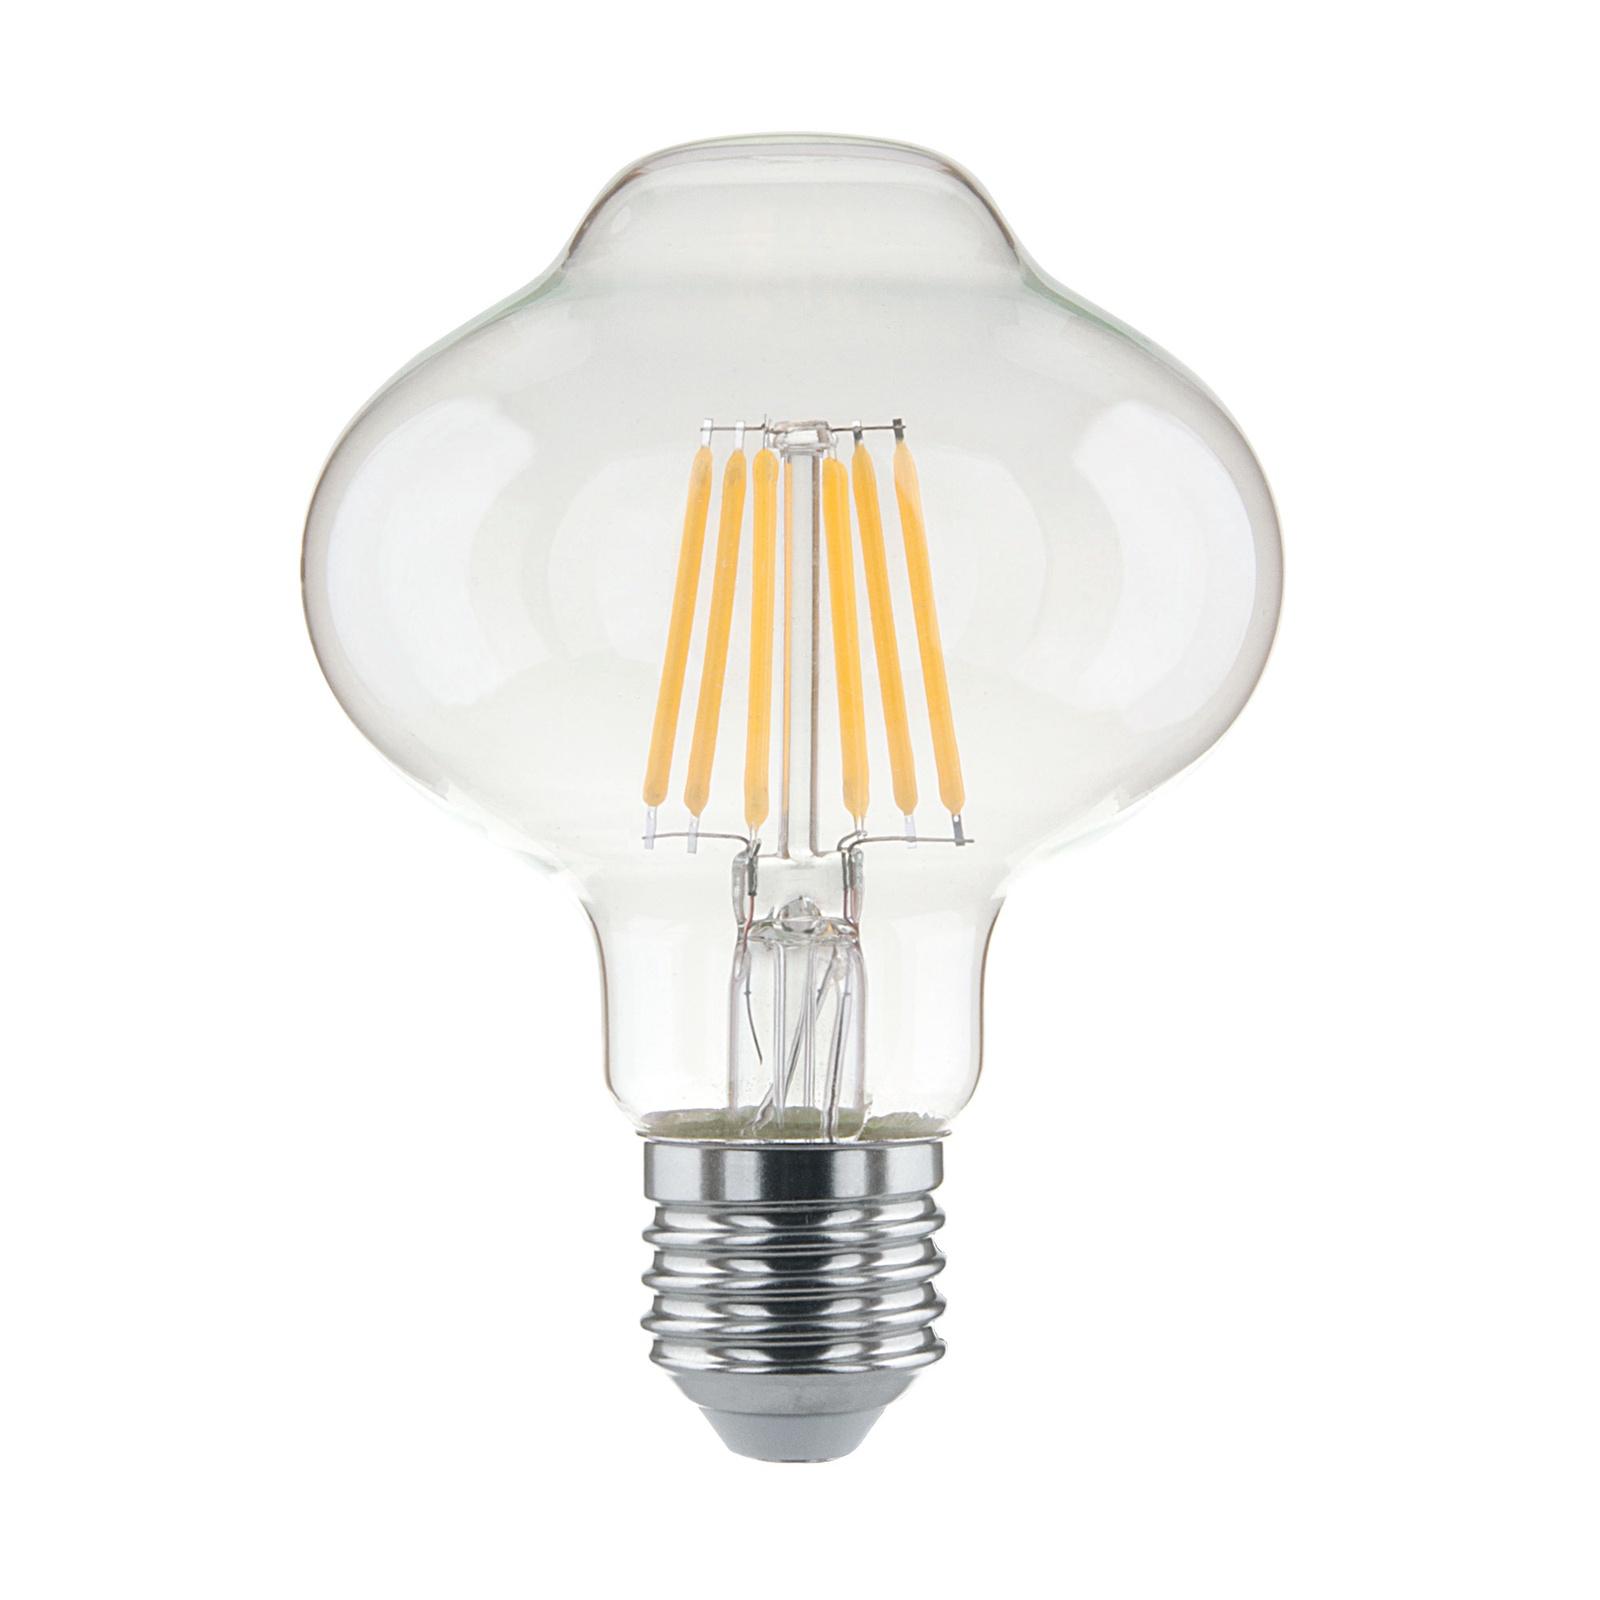 elektrostandard лампа светодиодная elektrostandard classic led d 10w 4200k e27 4690389085543 Лампочка Elektrostandard светодиодная FDL 10W 4200K E27, Нейтральный свет 10 Вт, Светодиодная